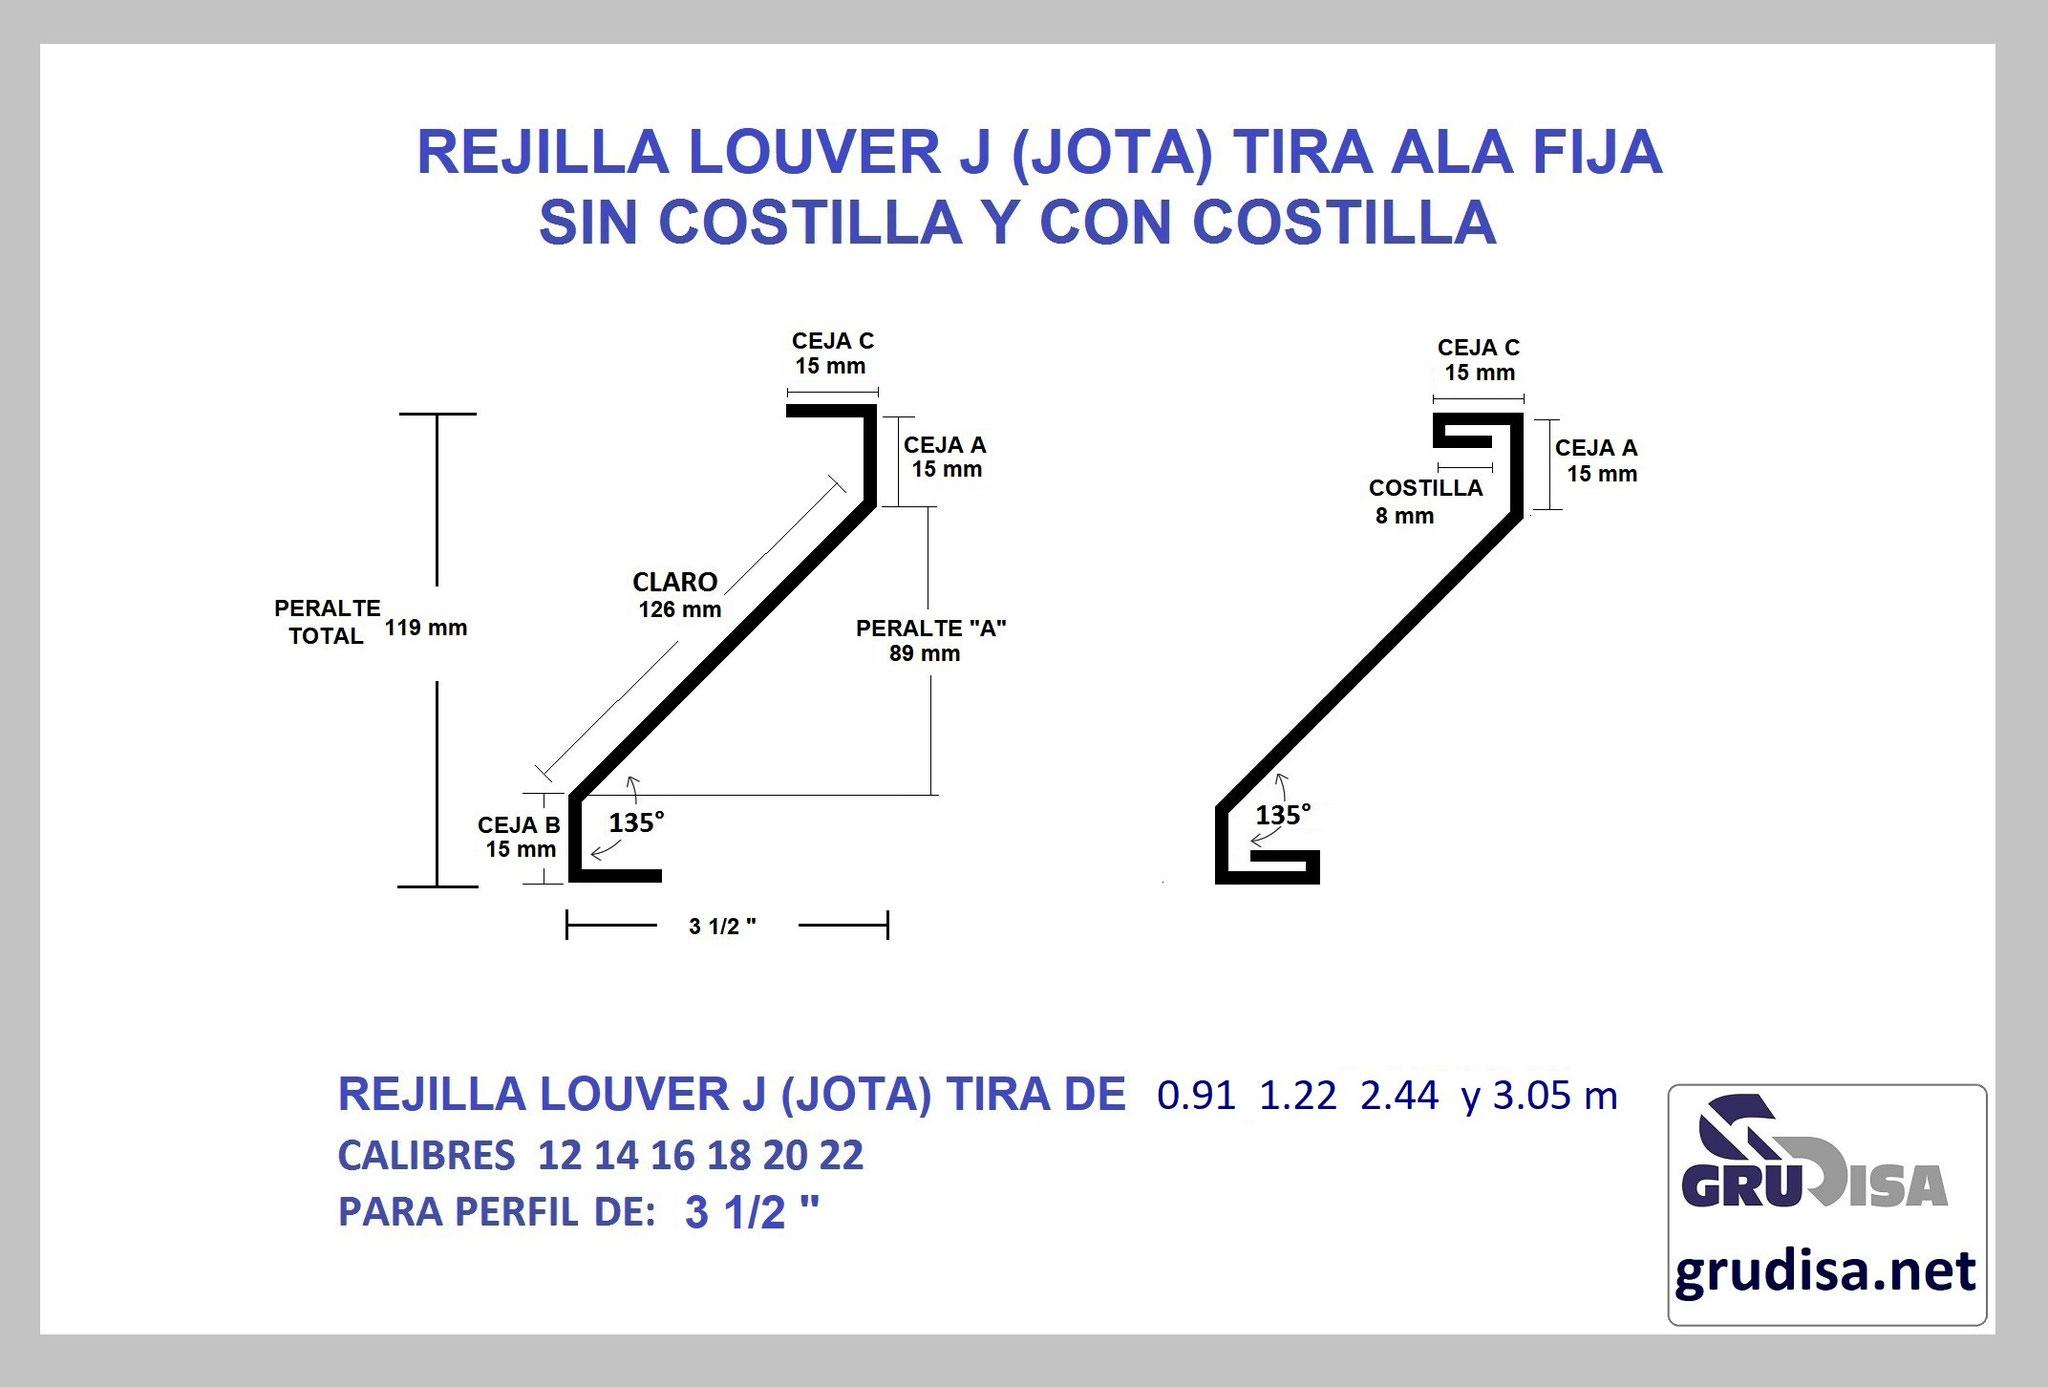 "TIRA PARA REJILLA LOUVER JOTA PARA PERFIL DE 3 1/2"""